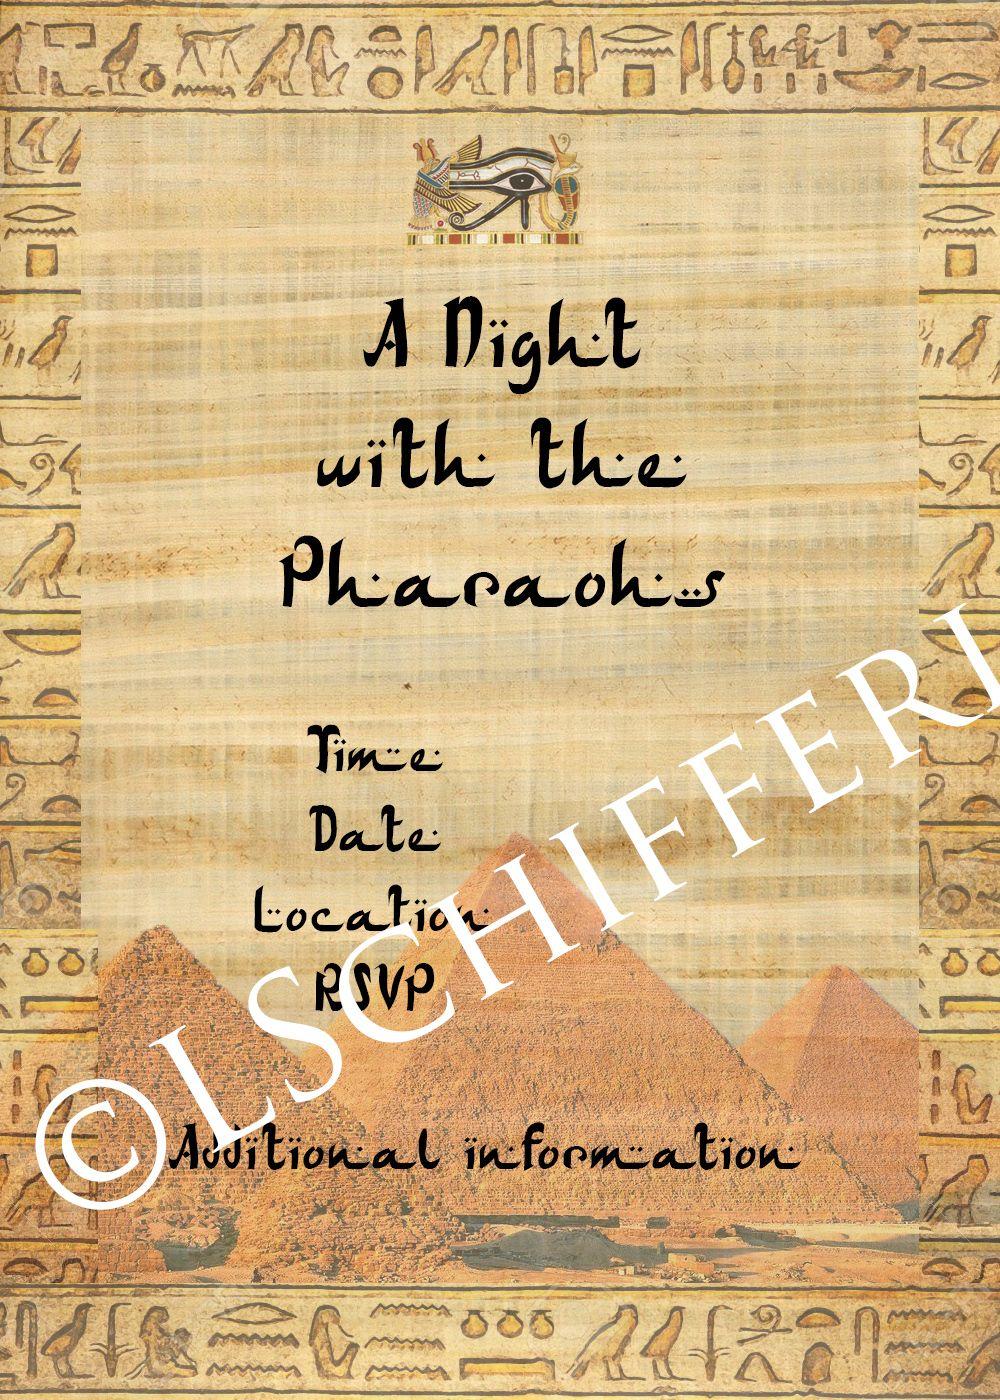 Ancient Egypt theme invitation | Sofía's15 | Invitations